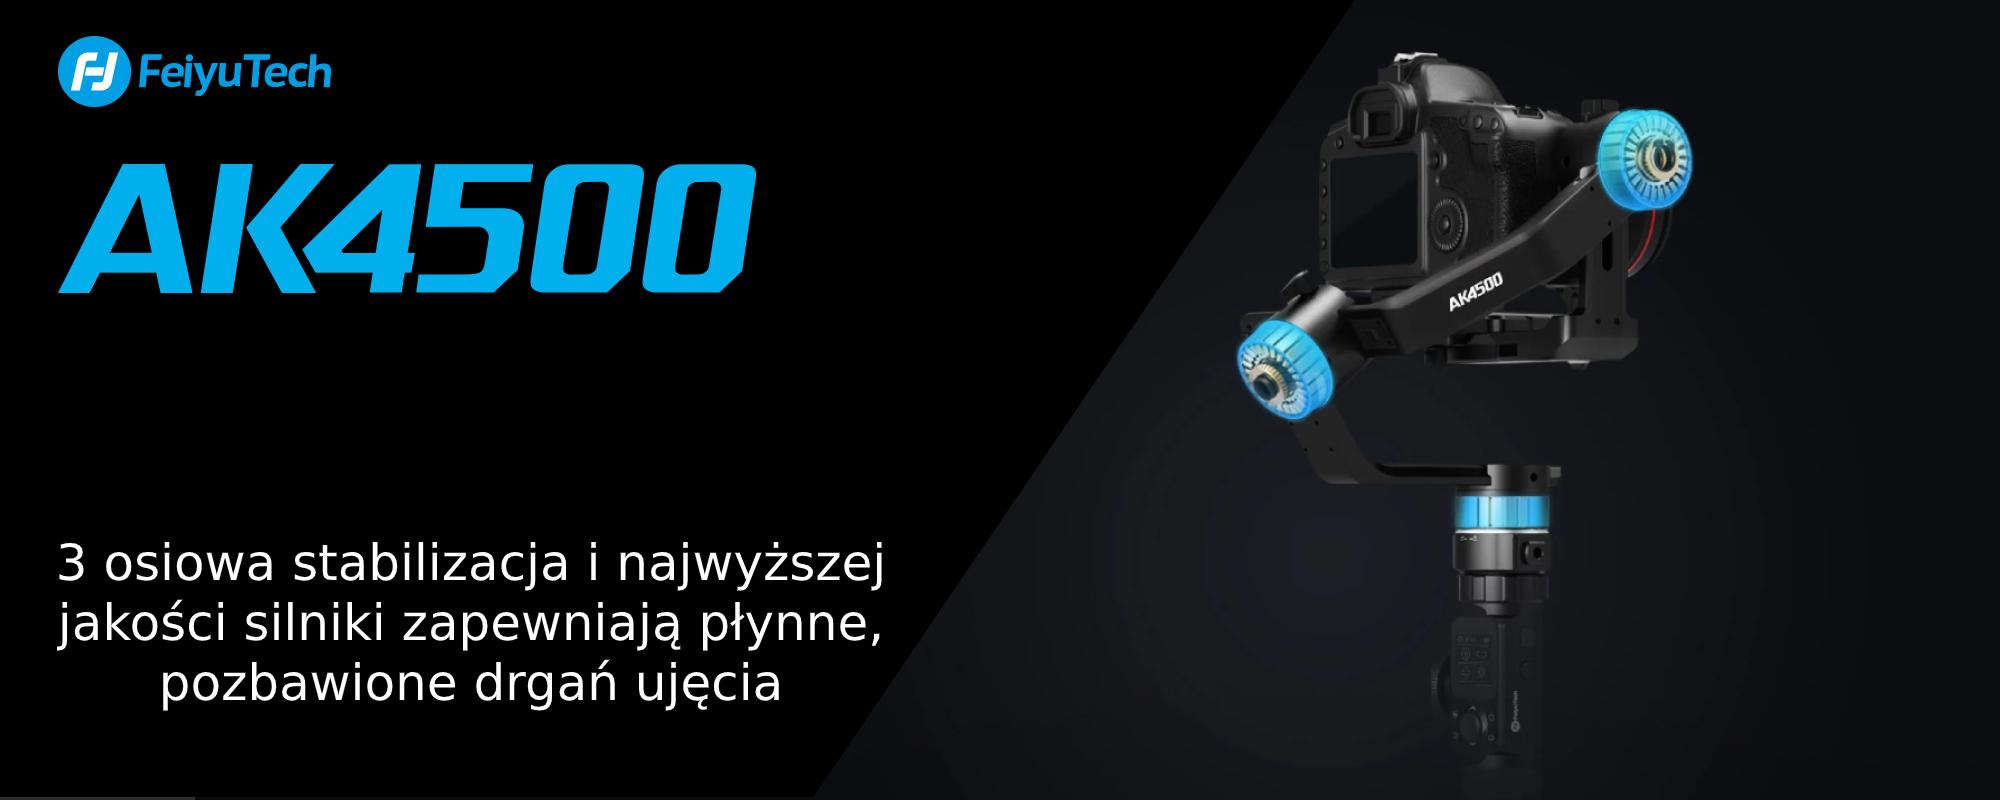 Grafika - Gimbal ręczny FeiyuTech AK4500 Standard Kit do aparatółw VDSLR i kamer_02.jpg